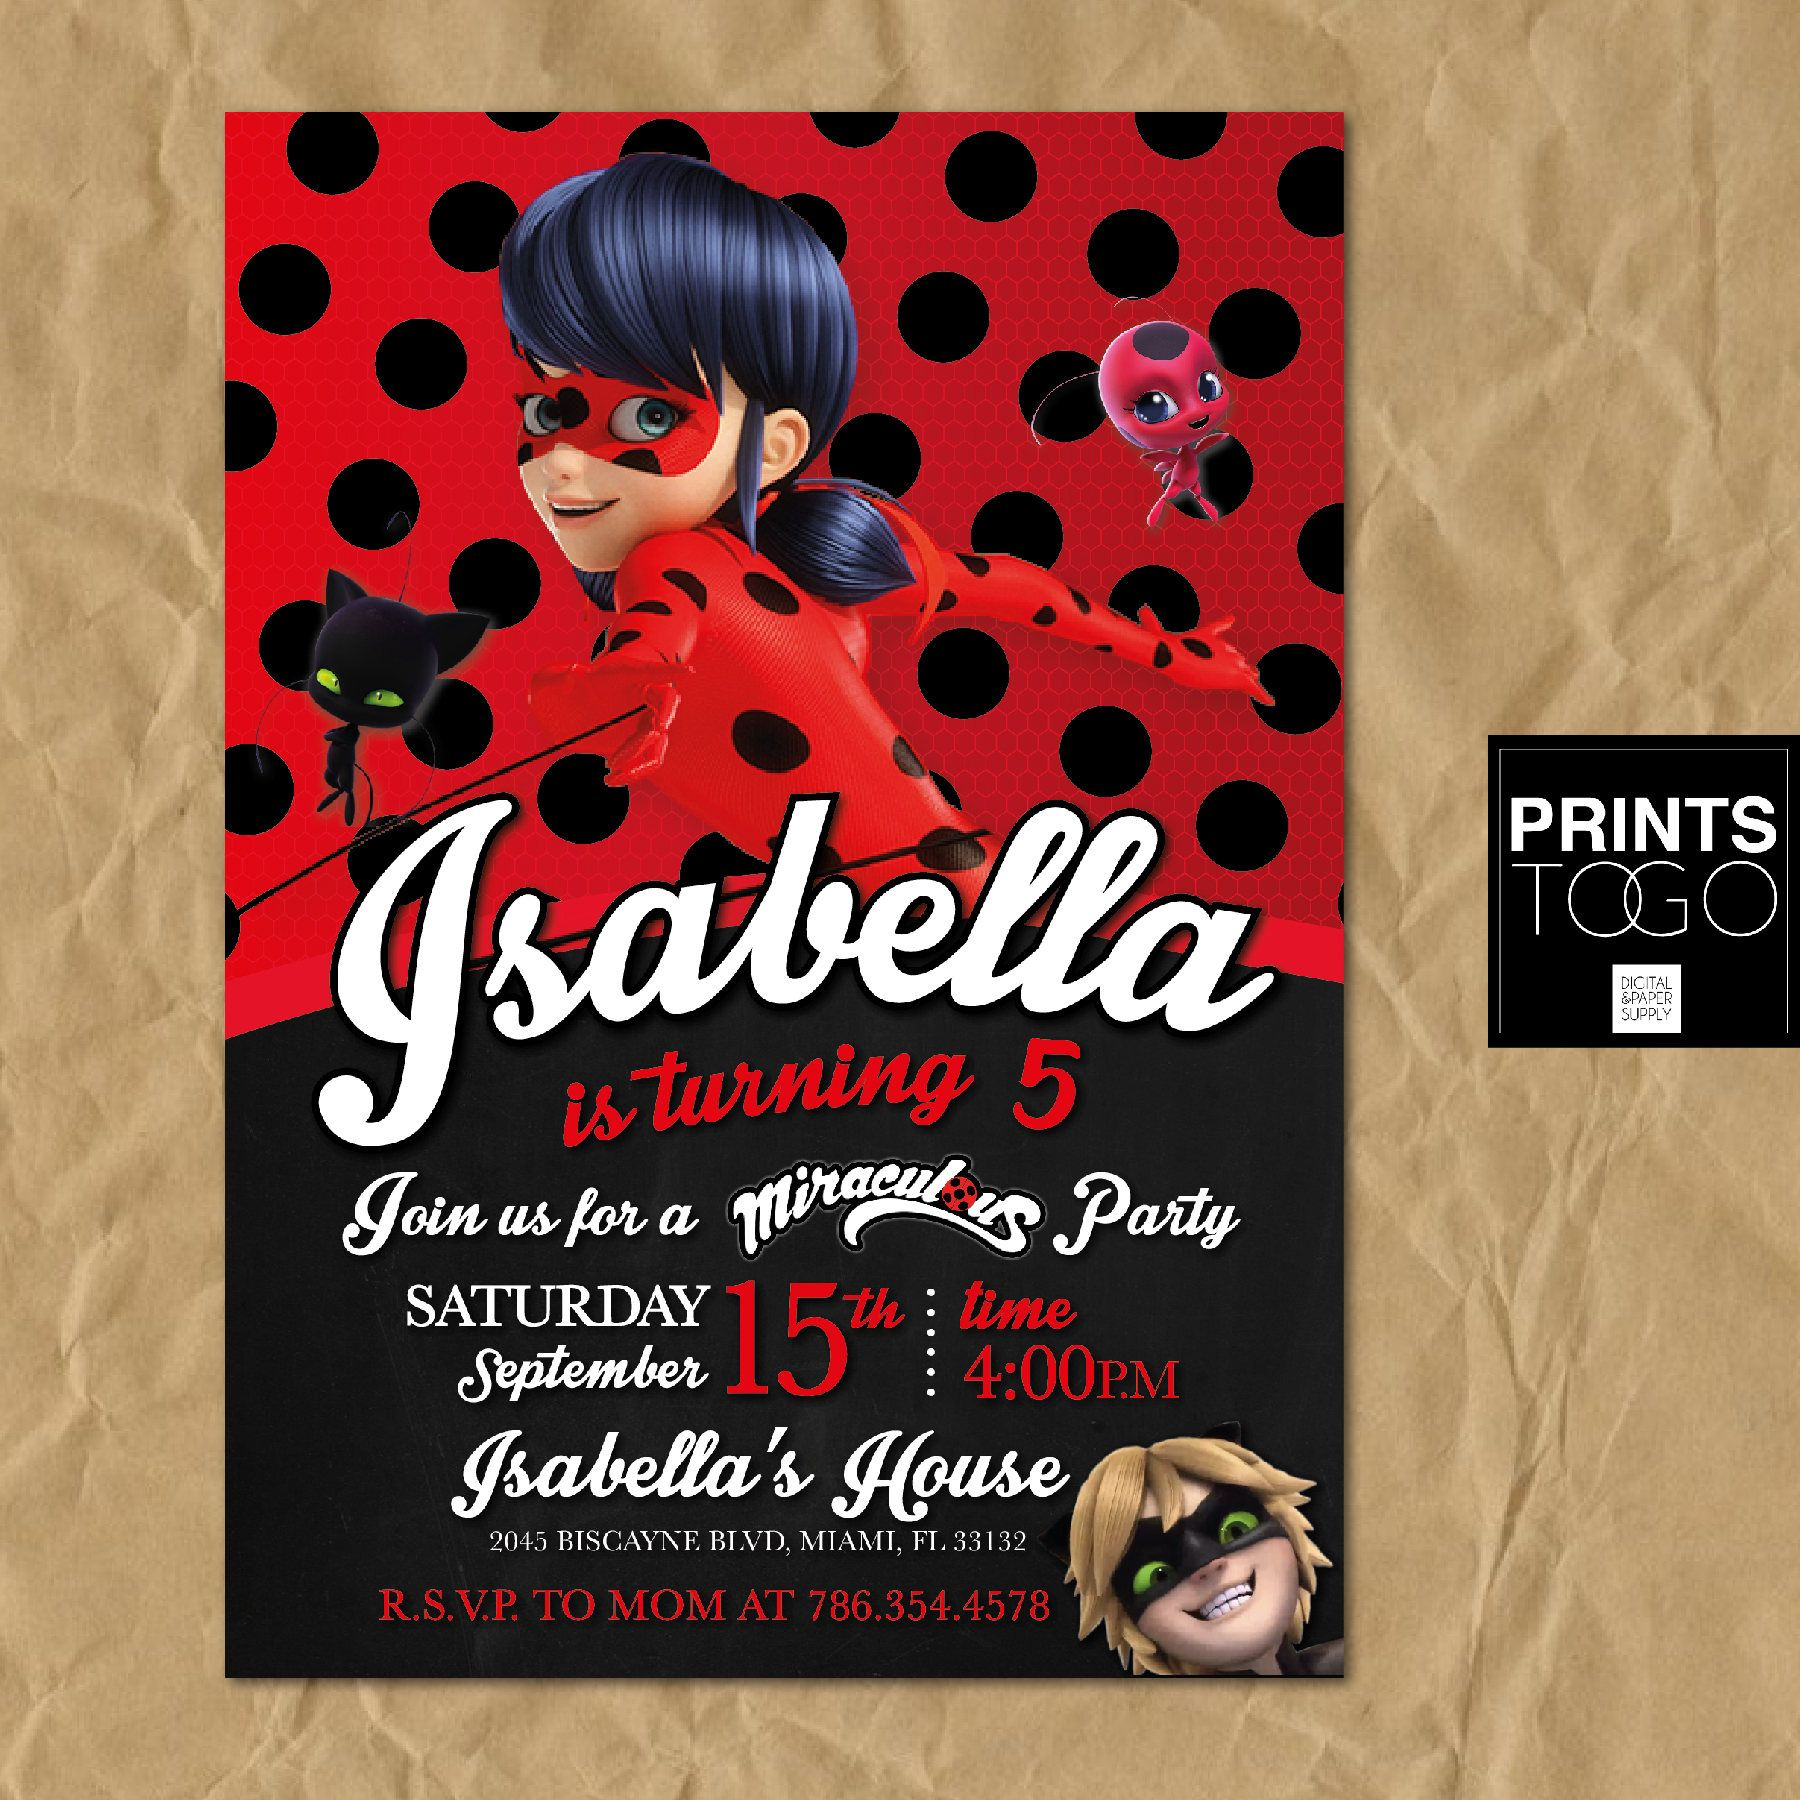 Miraculous Ladybug Birthday Invitations Free Template